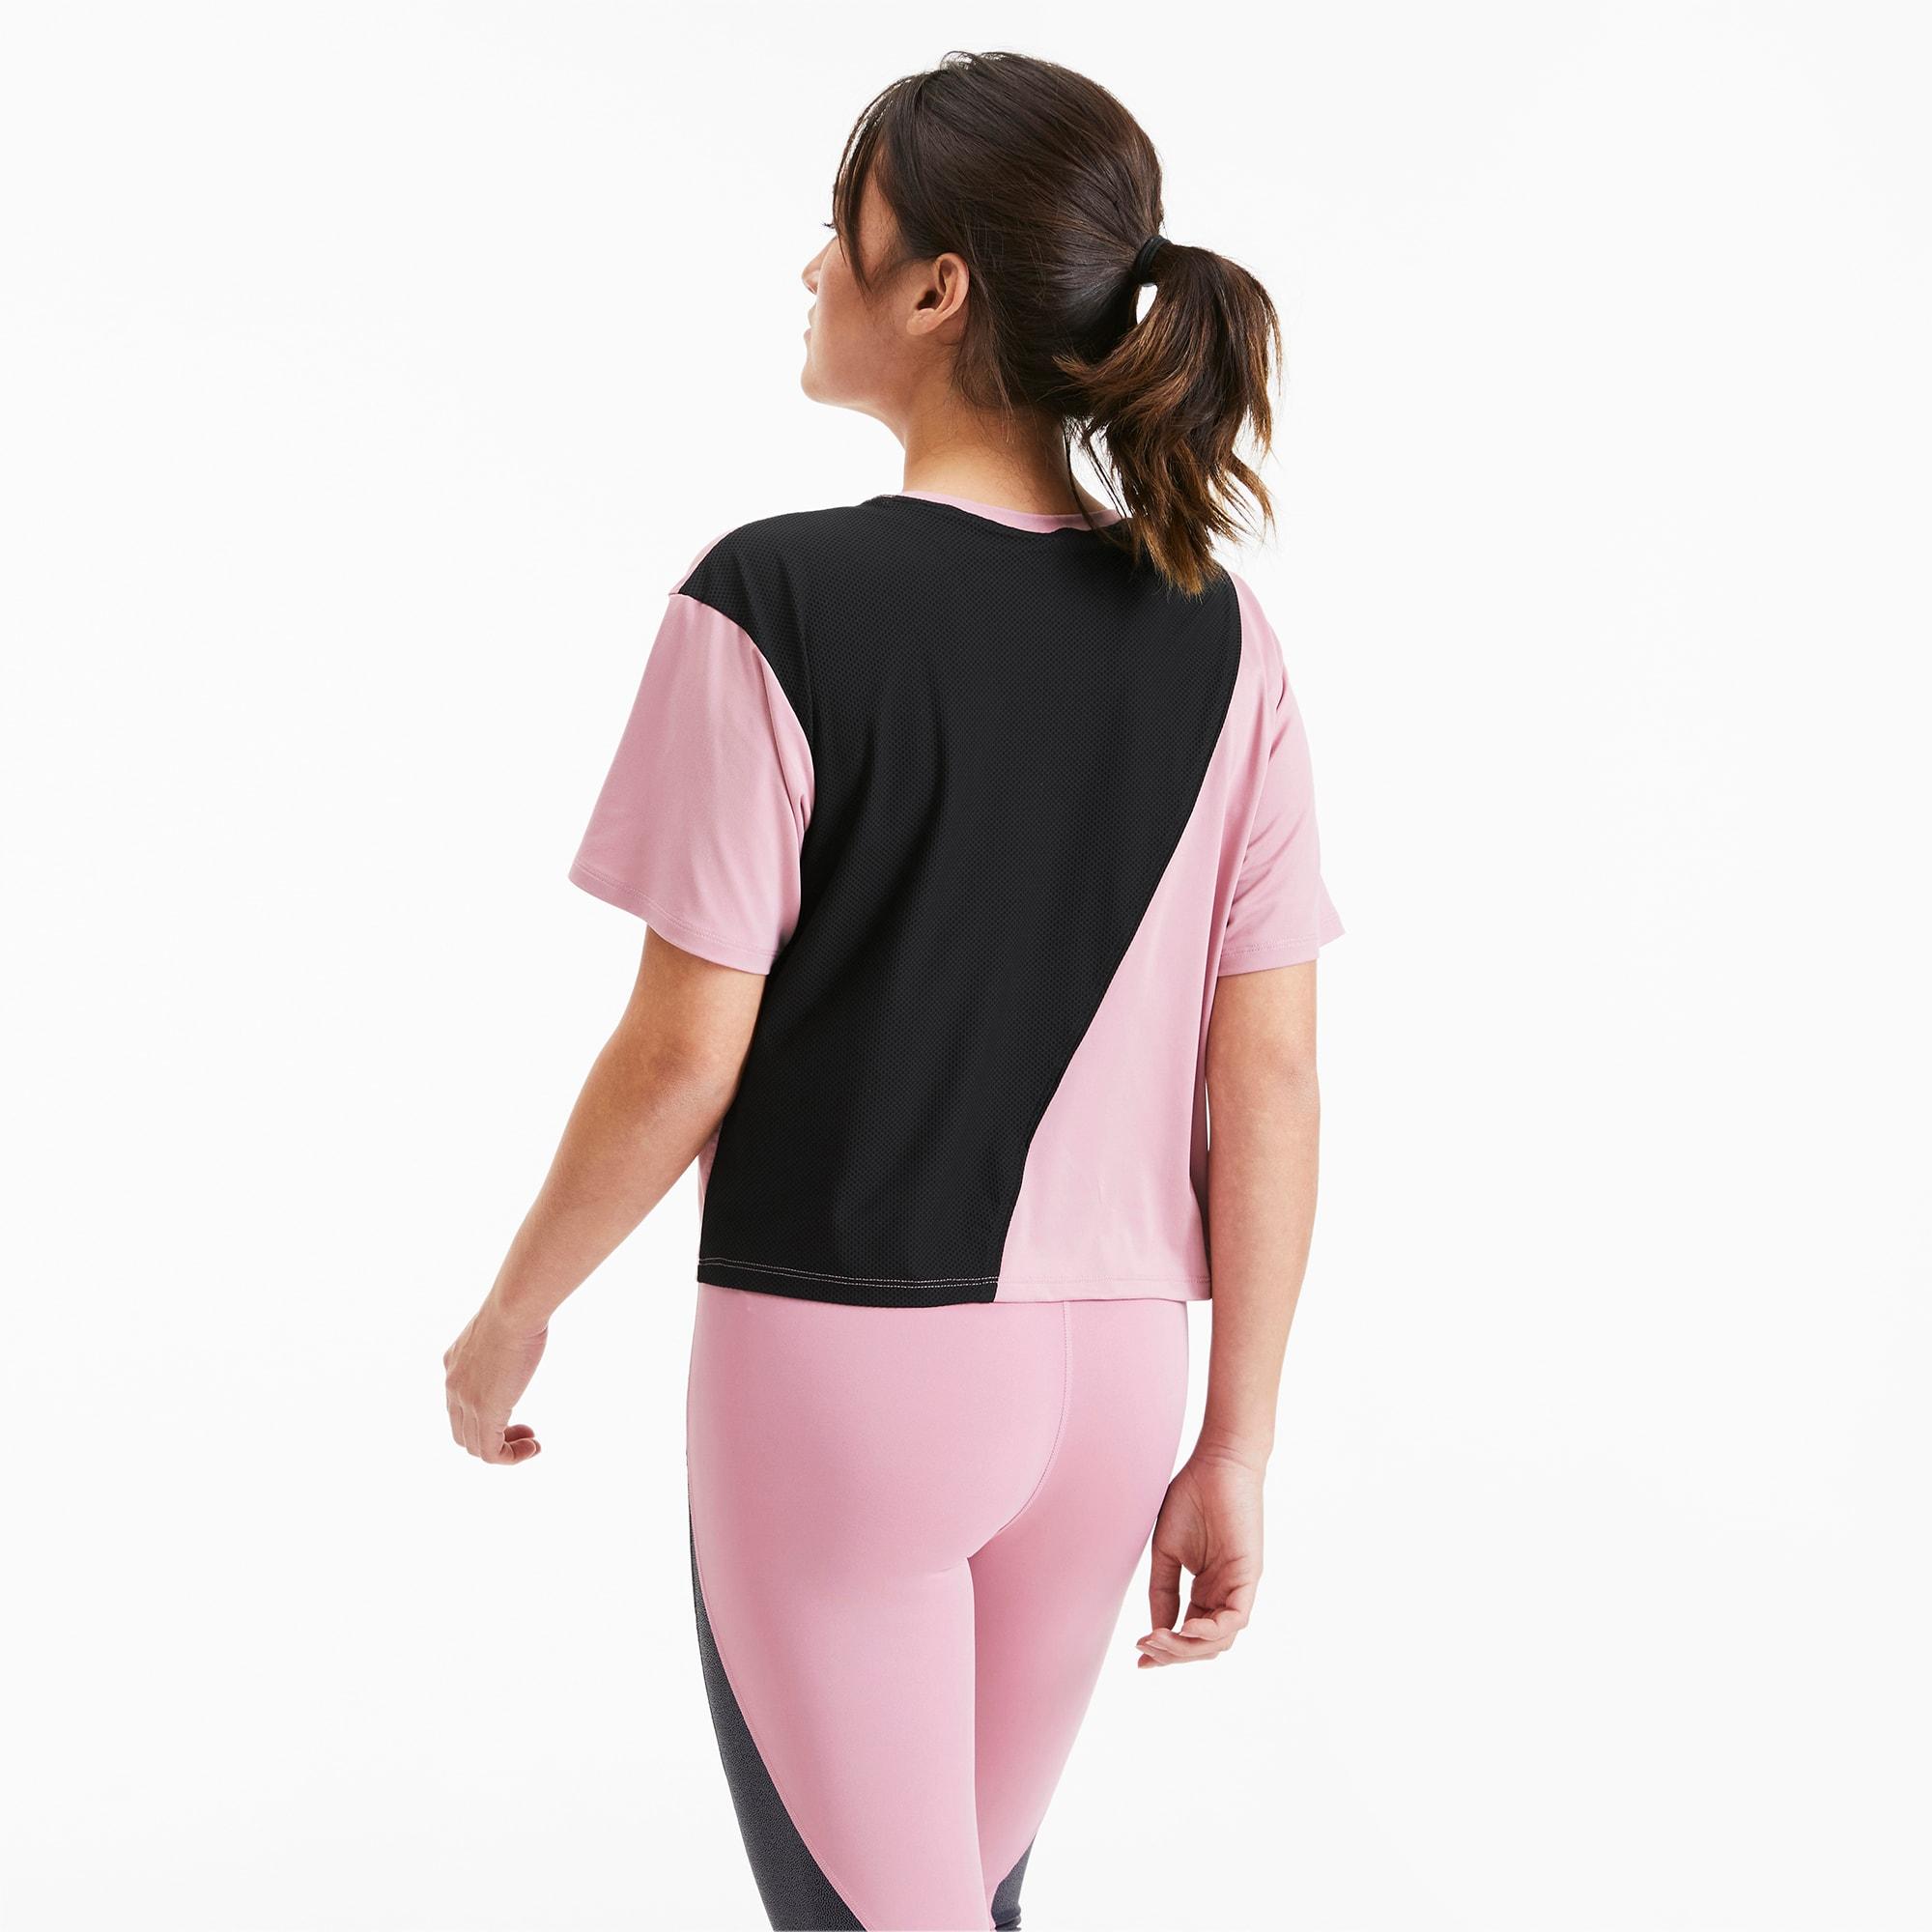 puma -  Pearl Damen Trainings-T-Shirt | Mit Aucun | Schwarz | Größe: XL